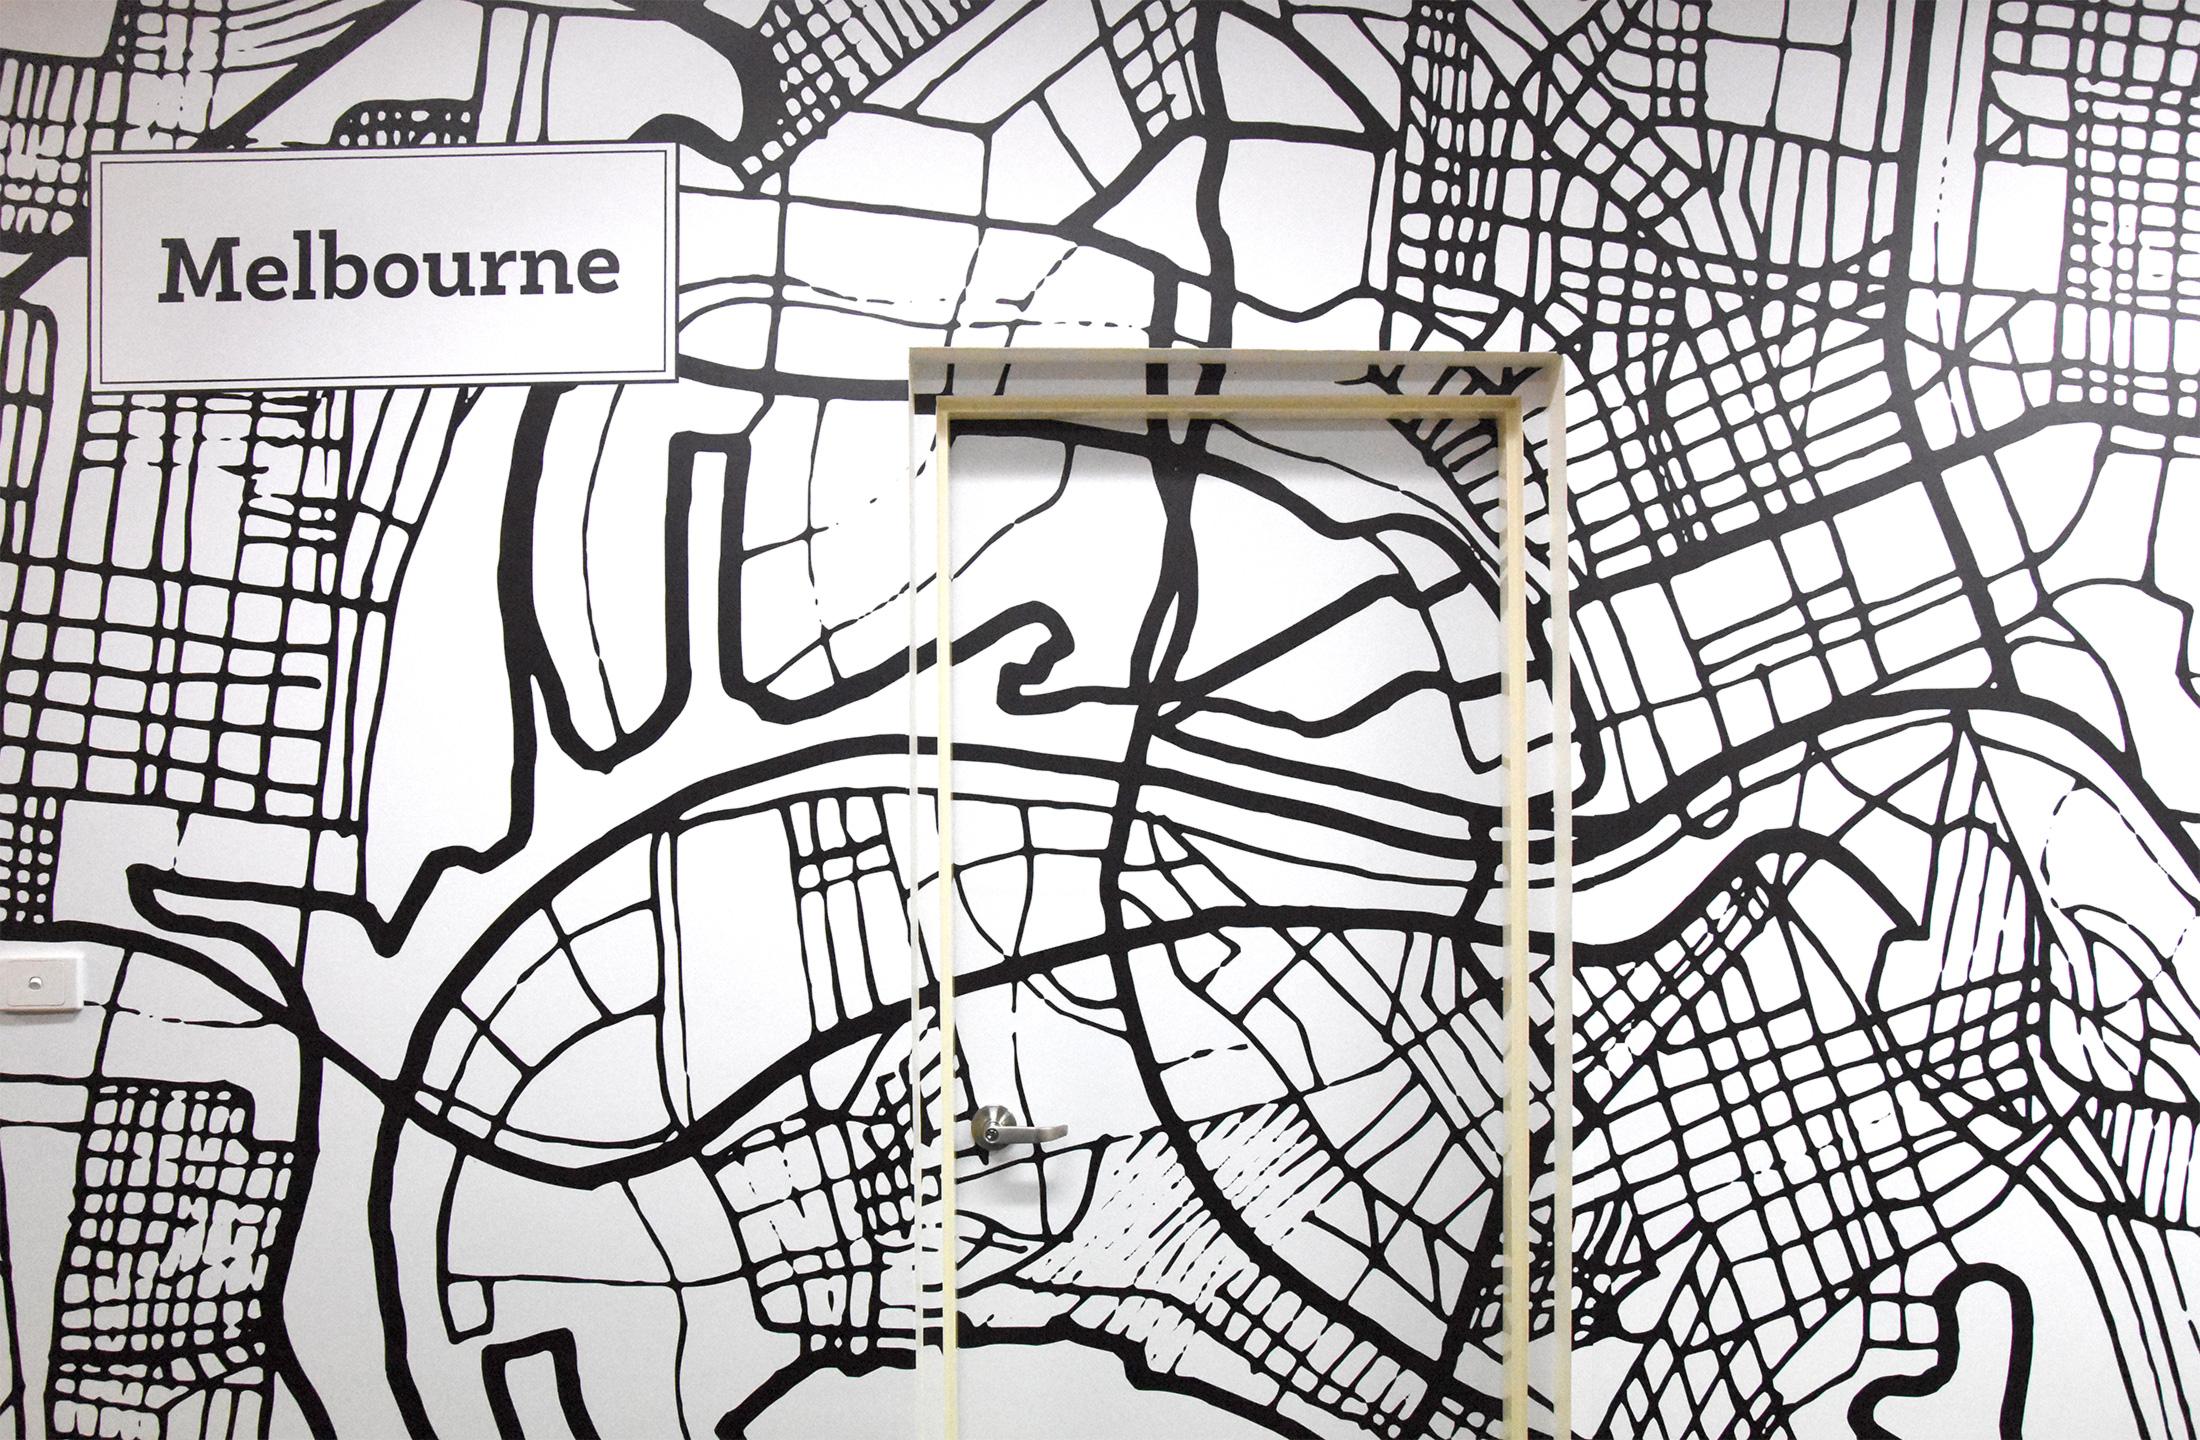 NPC-large-melbourne-map-wallpaper-02.jpg